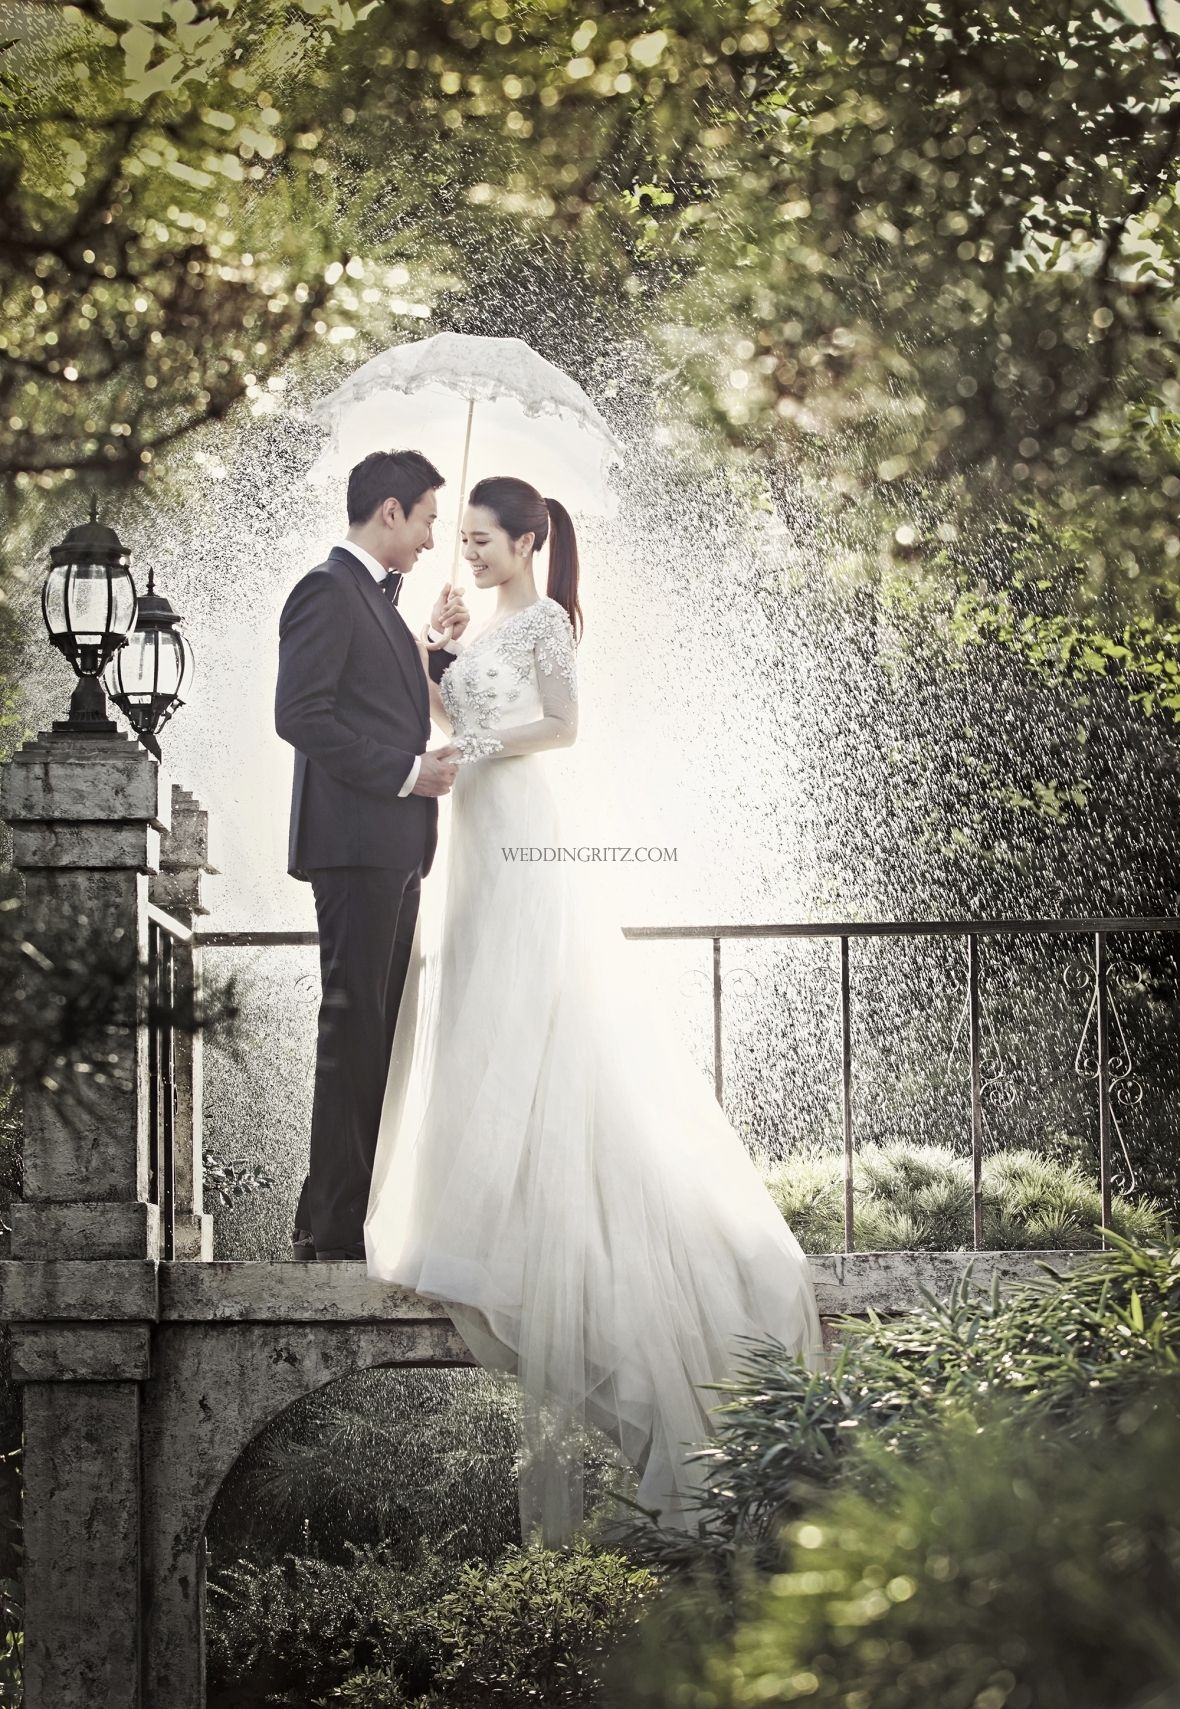 Korean wedding decoration ideas  Korea pre wedding Courtesy to dingritz  Prewedding